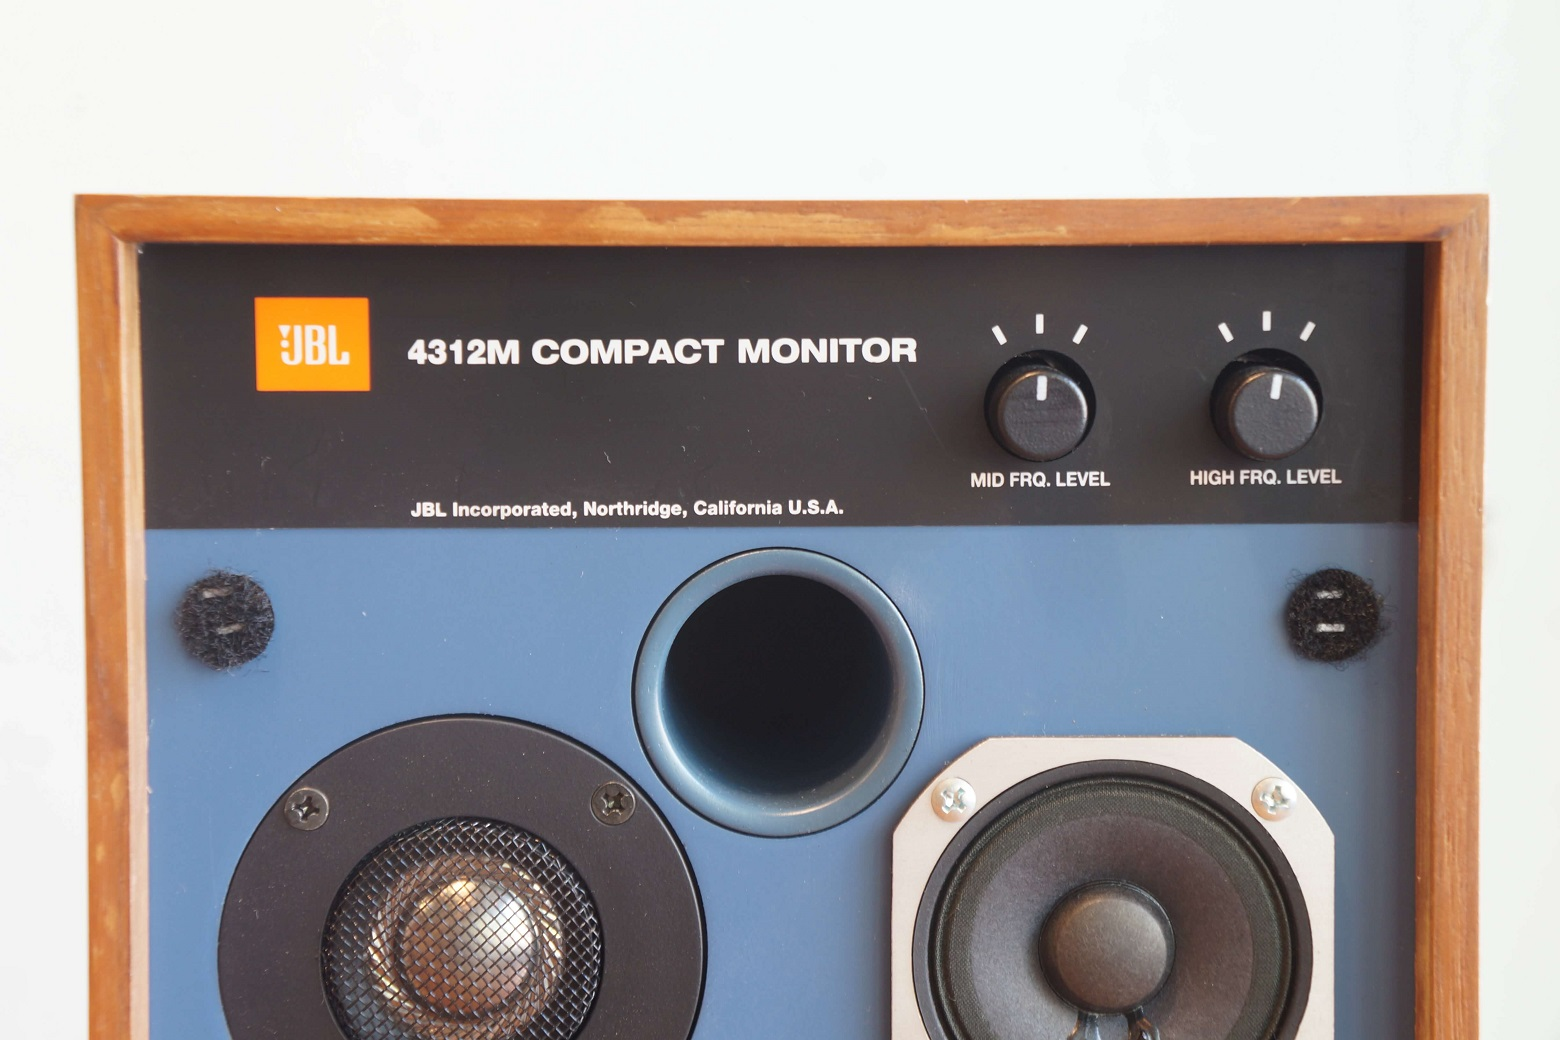 JBL compact monitor 4312M/JBL コンパクトモニター 4312M